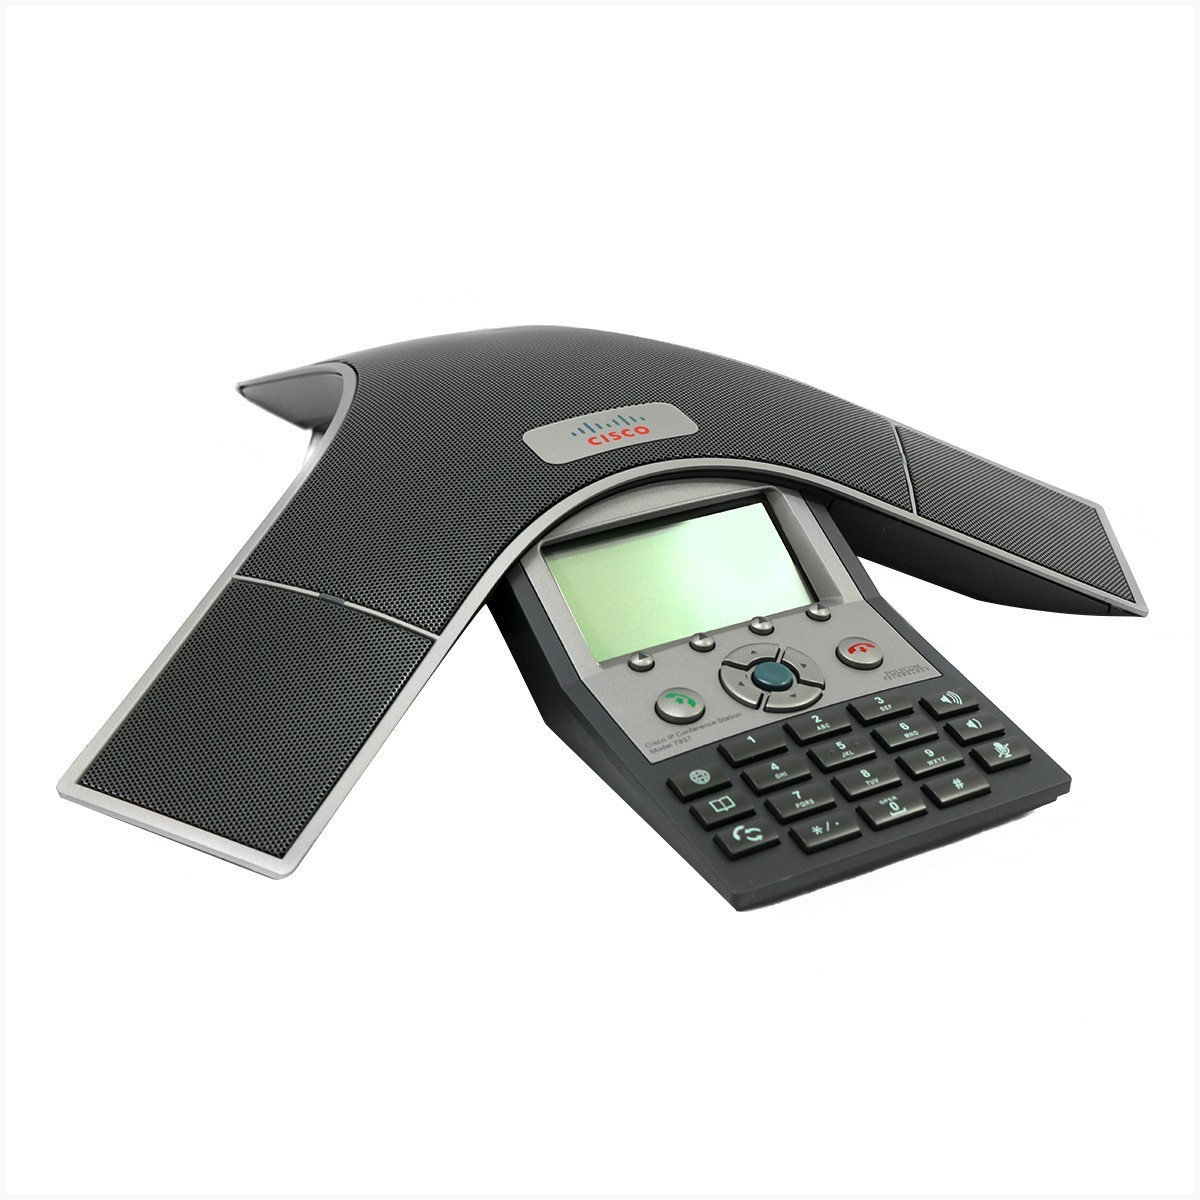 Telefone Cisco ip conference station 7937g - usado